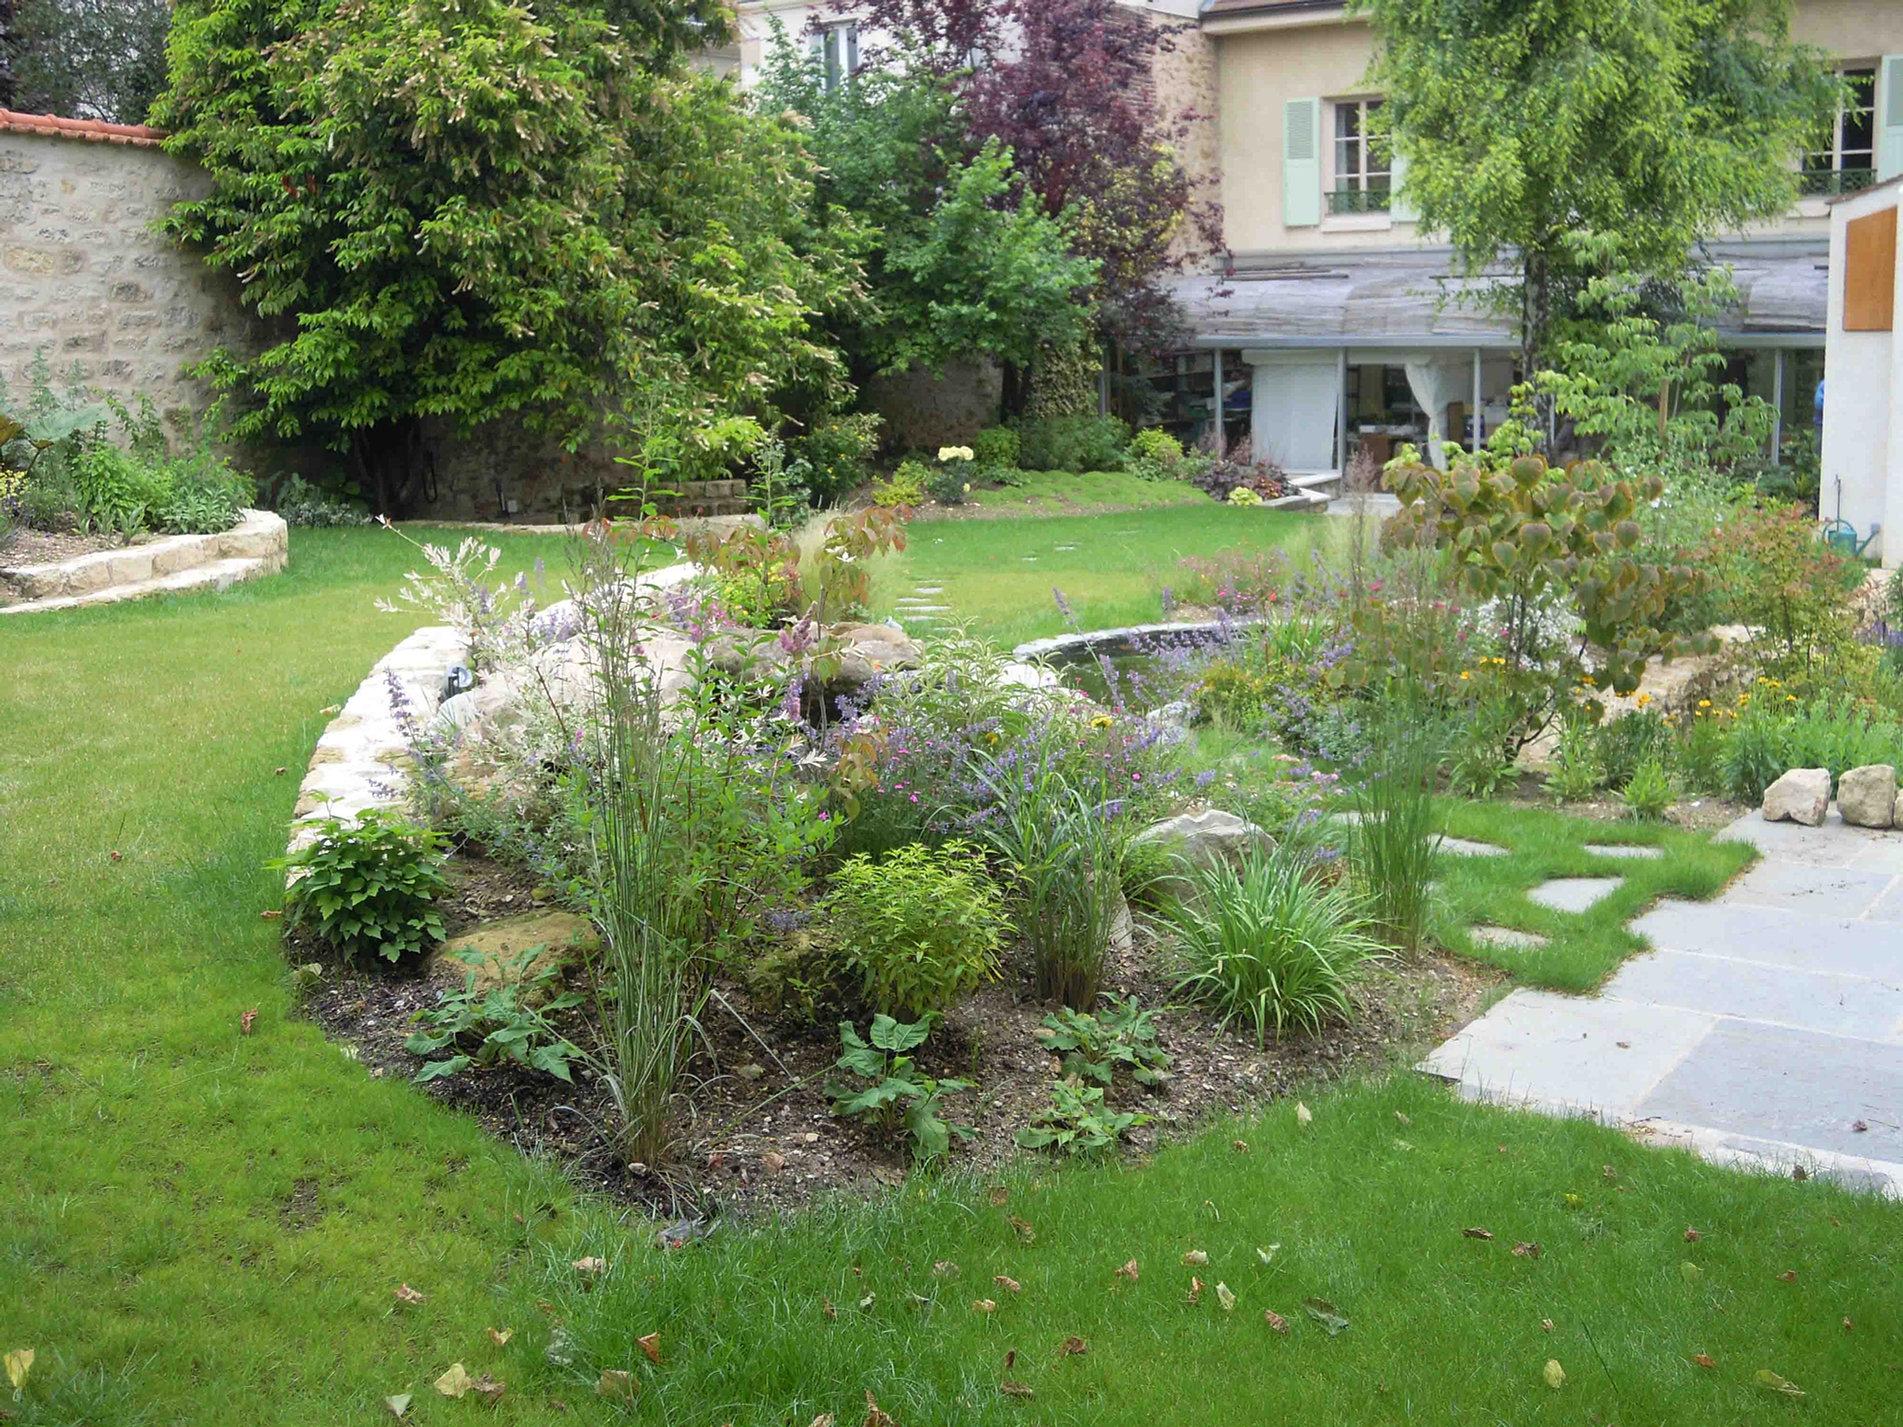 Biovert jardins entretien de parcs jardins terrasses balcons for Entreprise entretien jardin 18